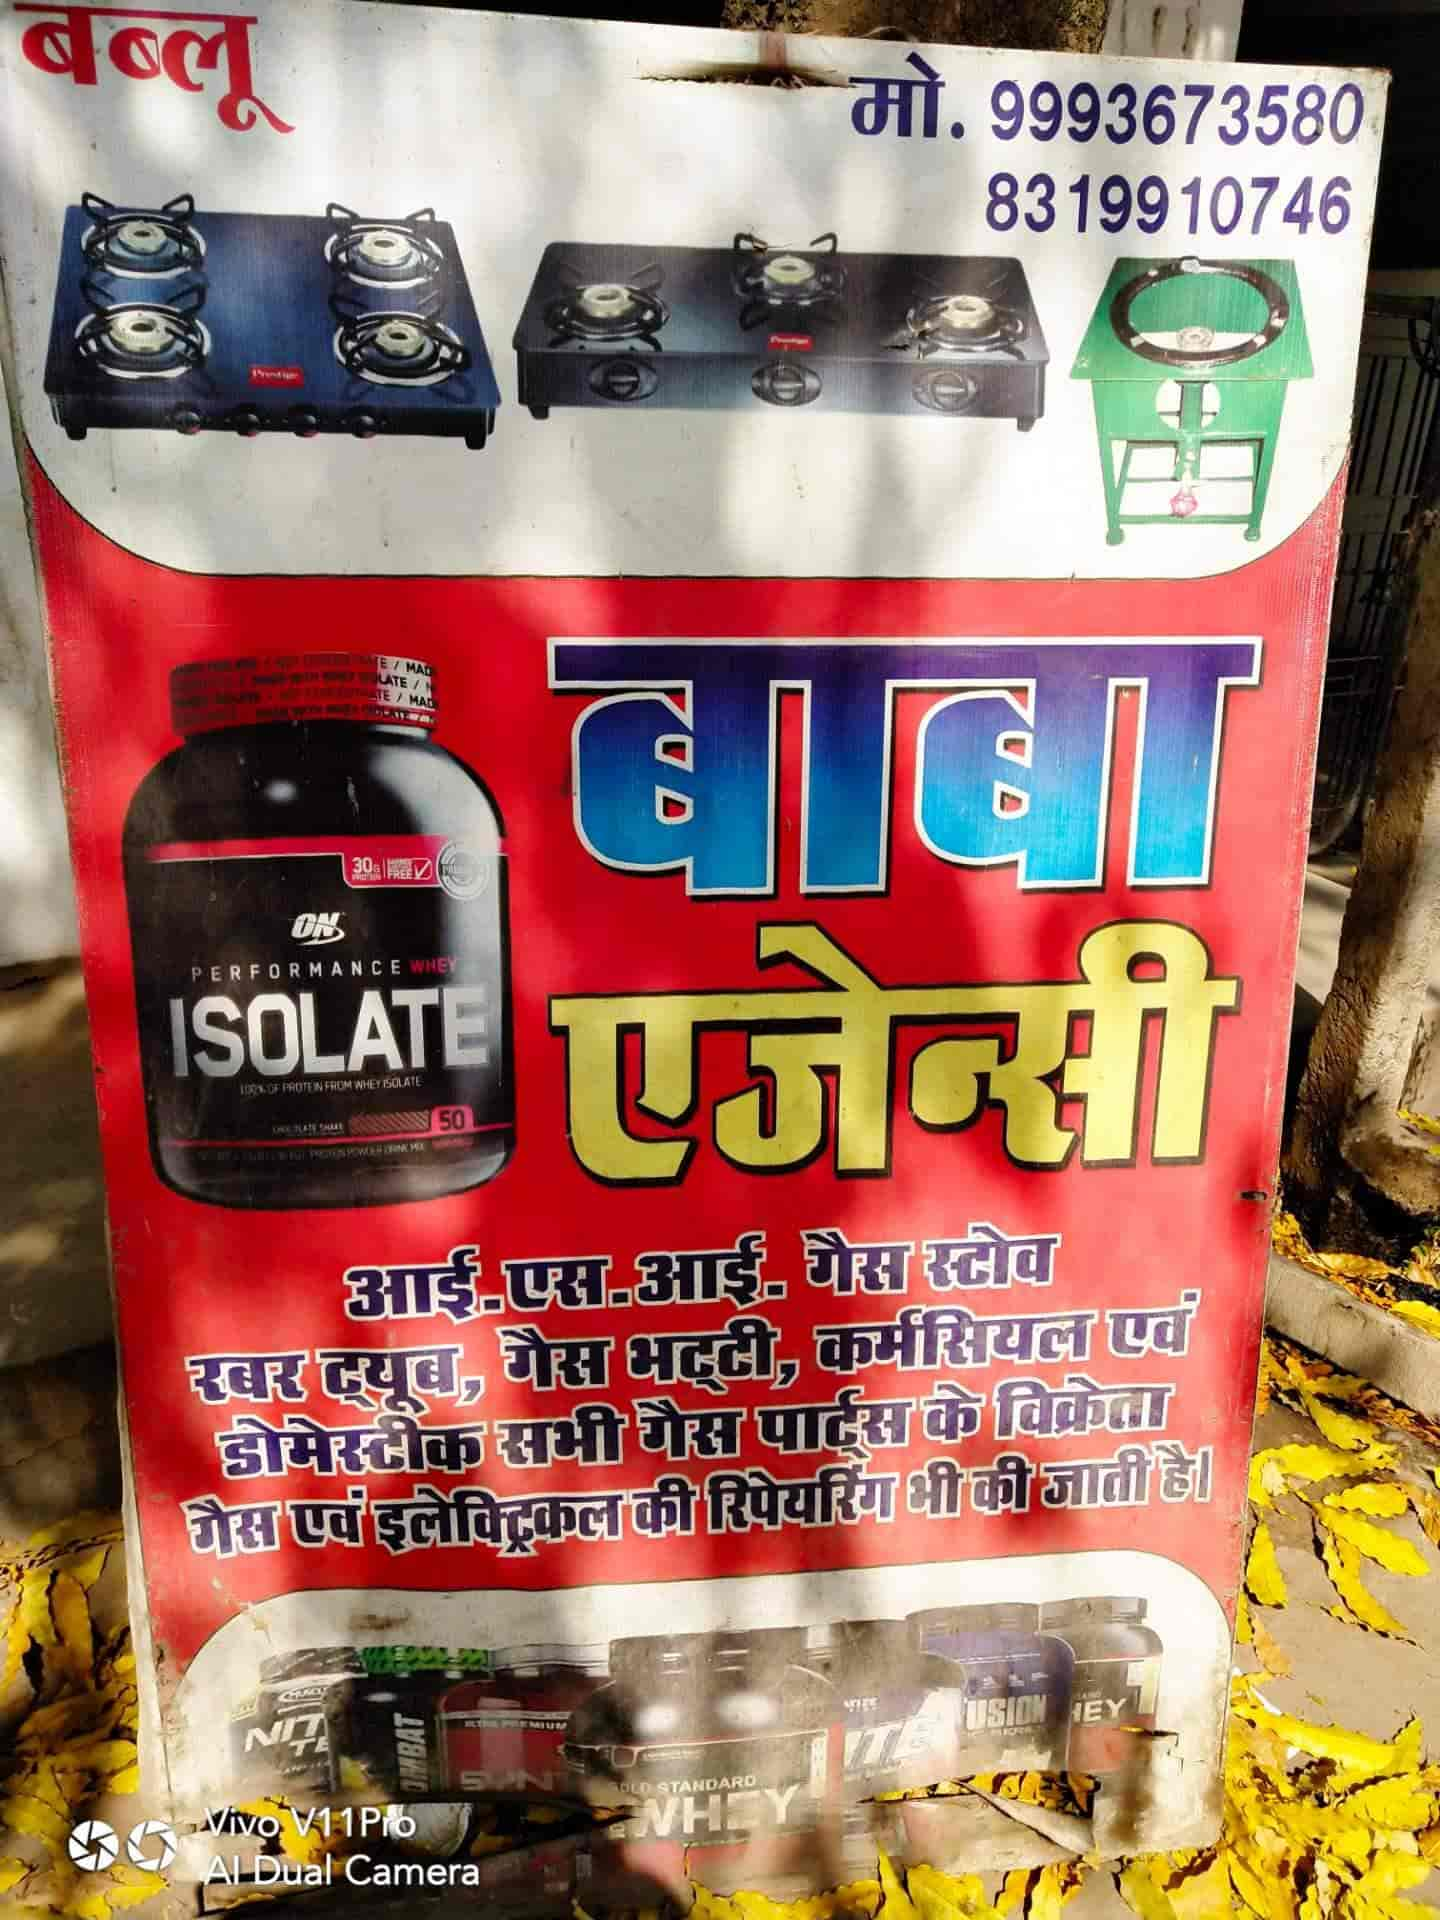 Baba Agency, Ashoka Garden - Electrical Shops in Bhopal